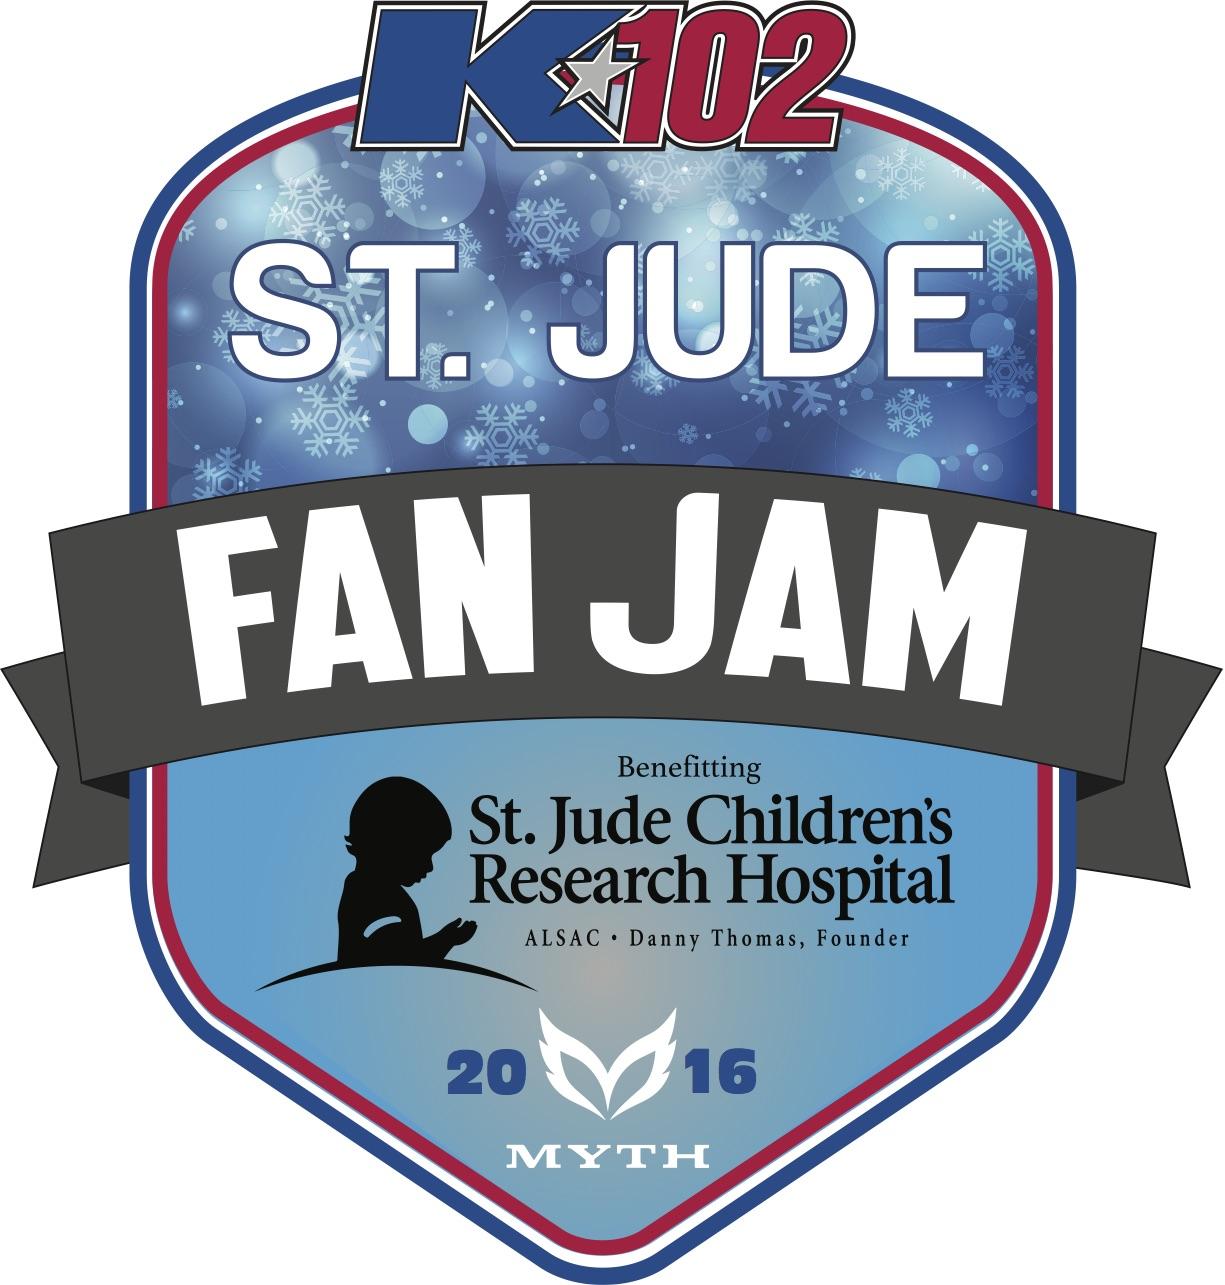 K102's St. Jude Fan Jam 2016 Myth 11/30